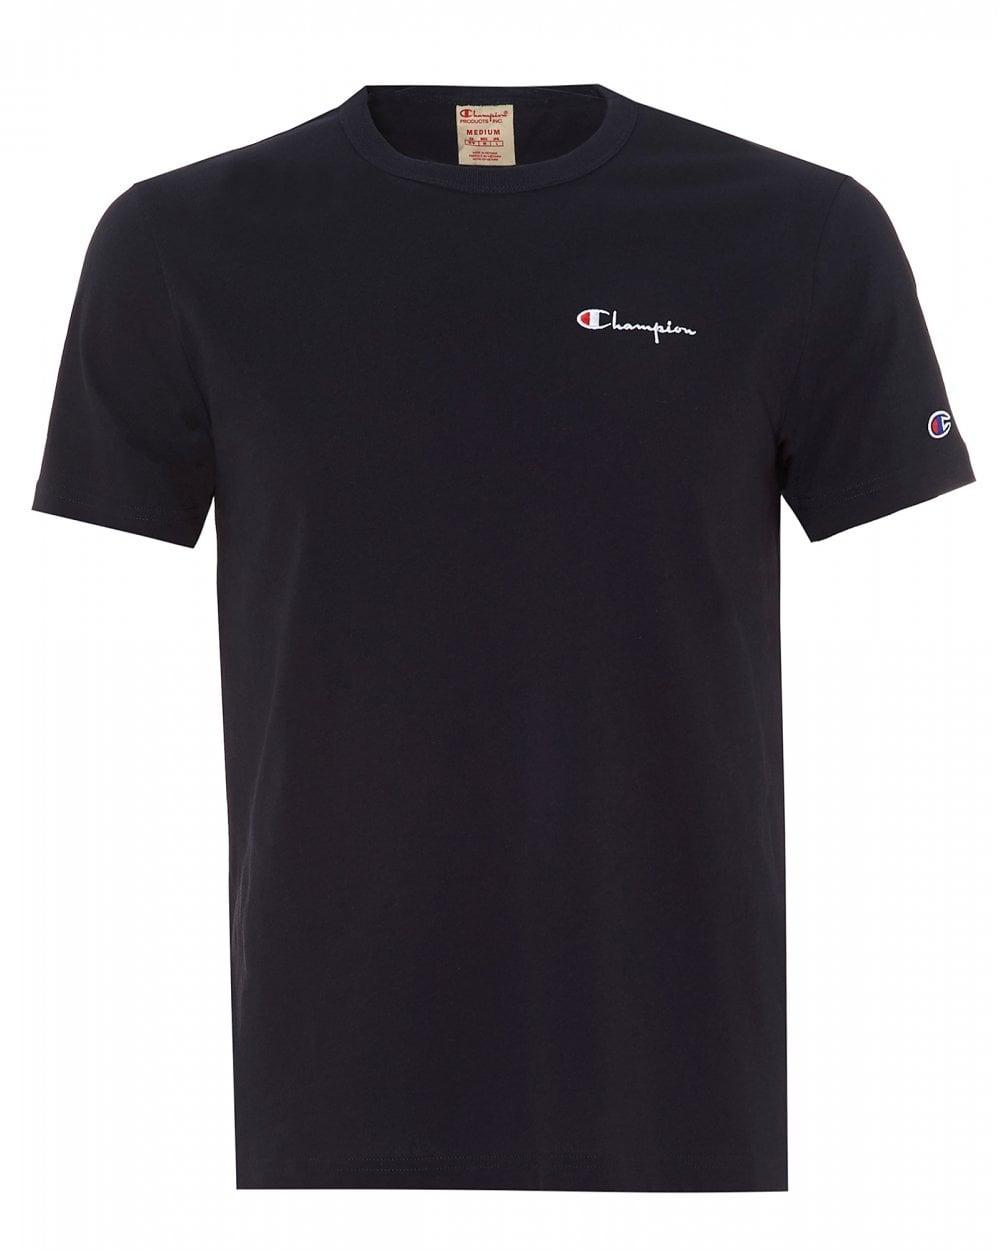 a916f4e0 Champion Mens Small Script T-Shirt, Navy Blue Crew Neck Tee